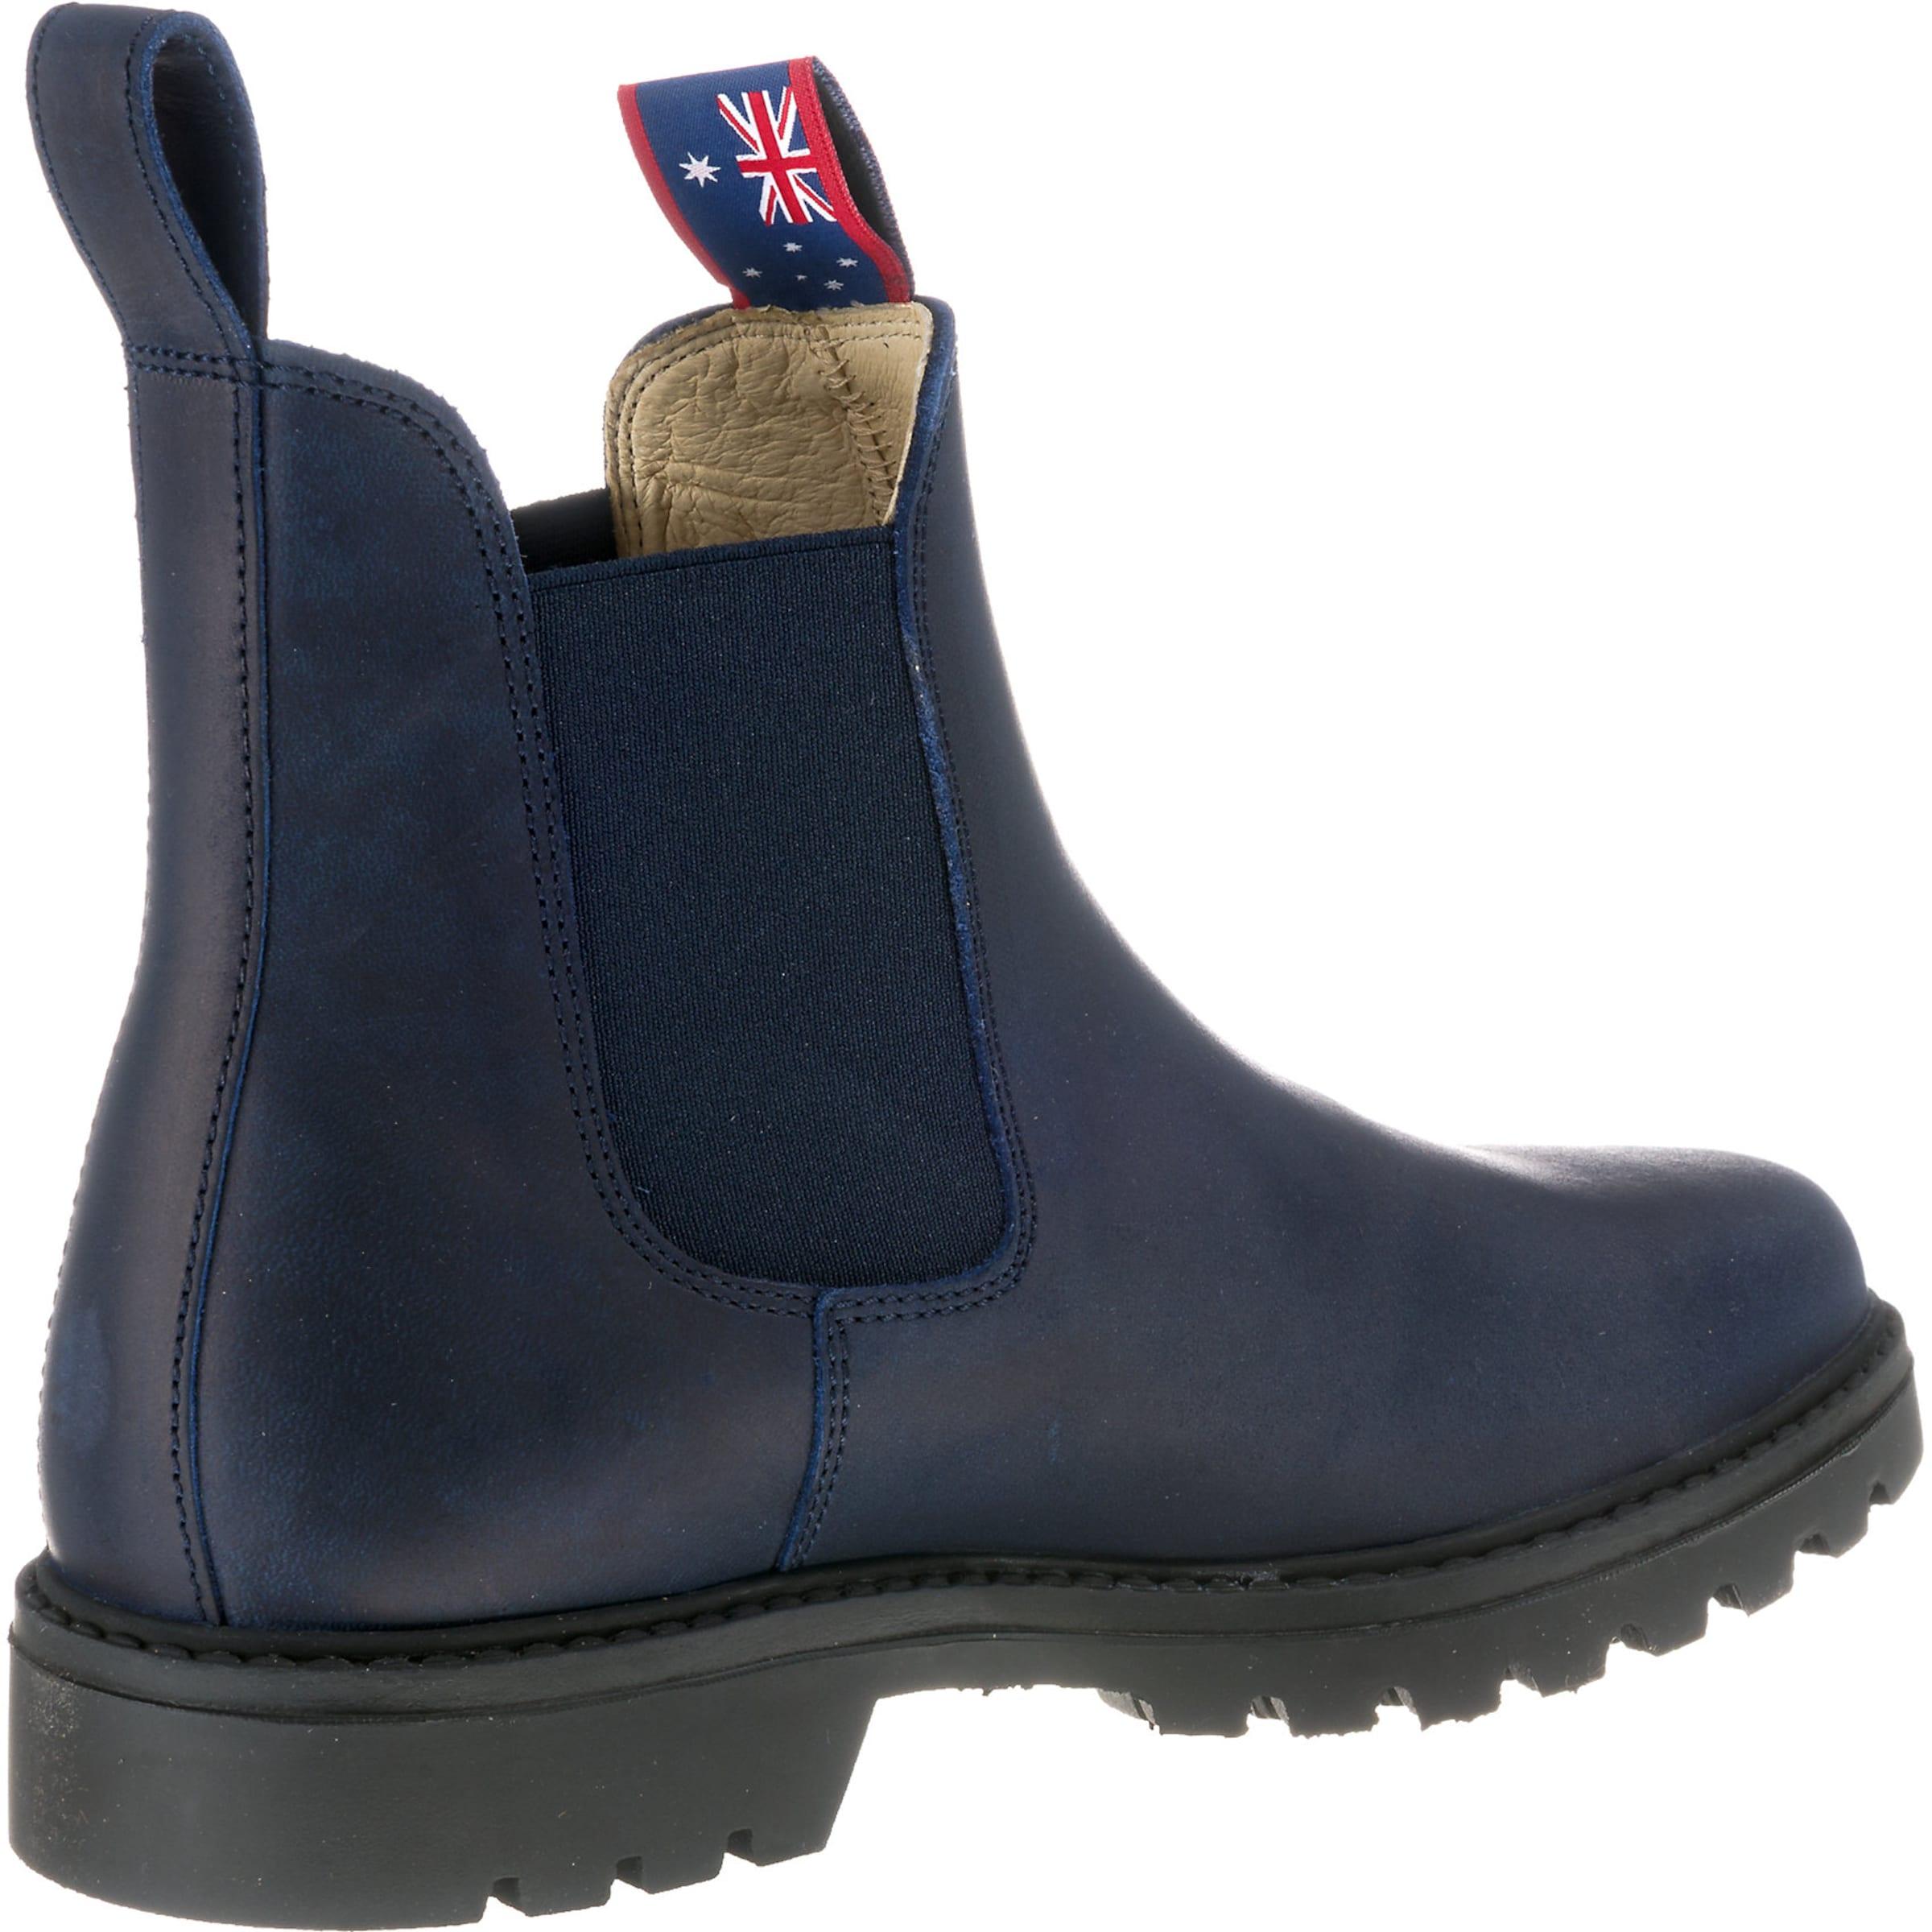 Schwarzmeliert Blue NavyRot Heeler Weiß Boots In 'meryl' Chelsea wPX8n0kO